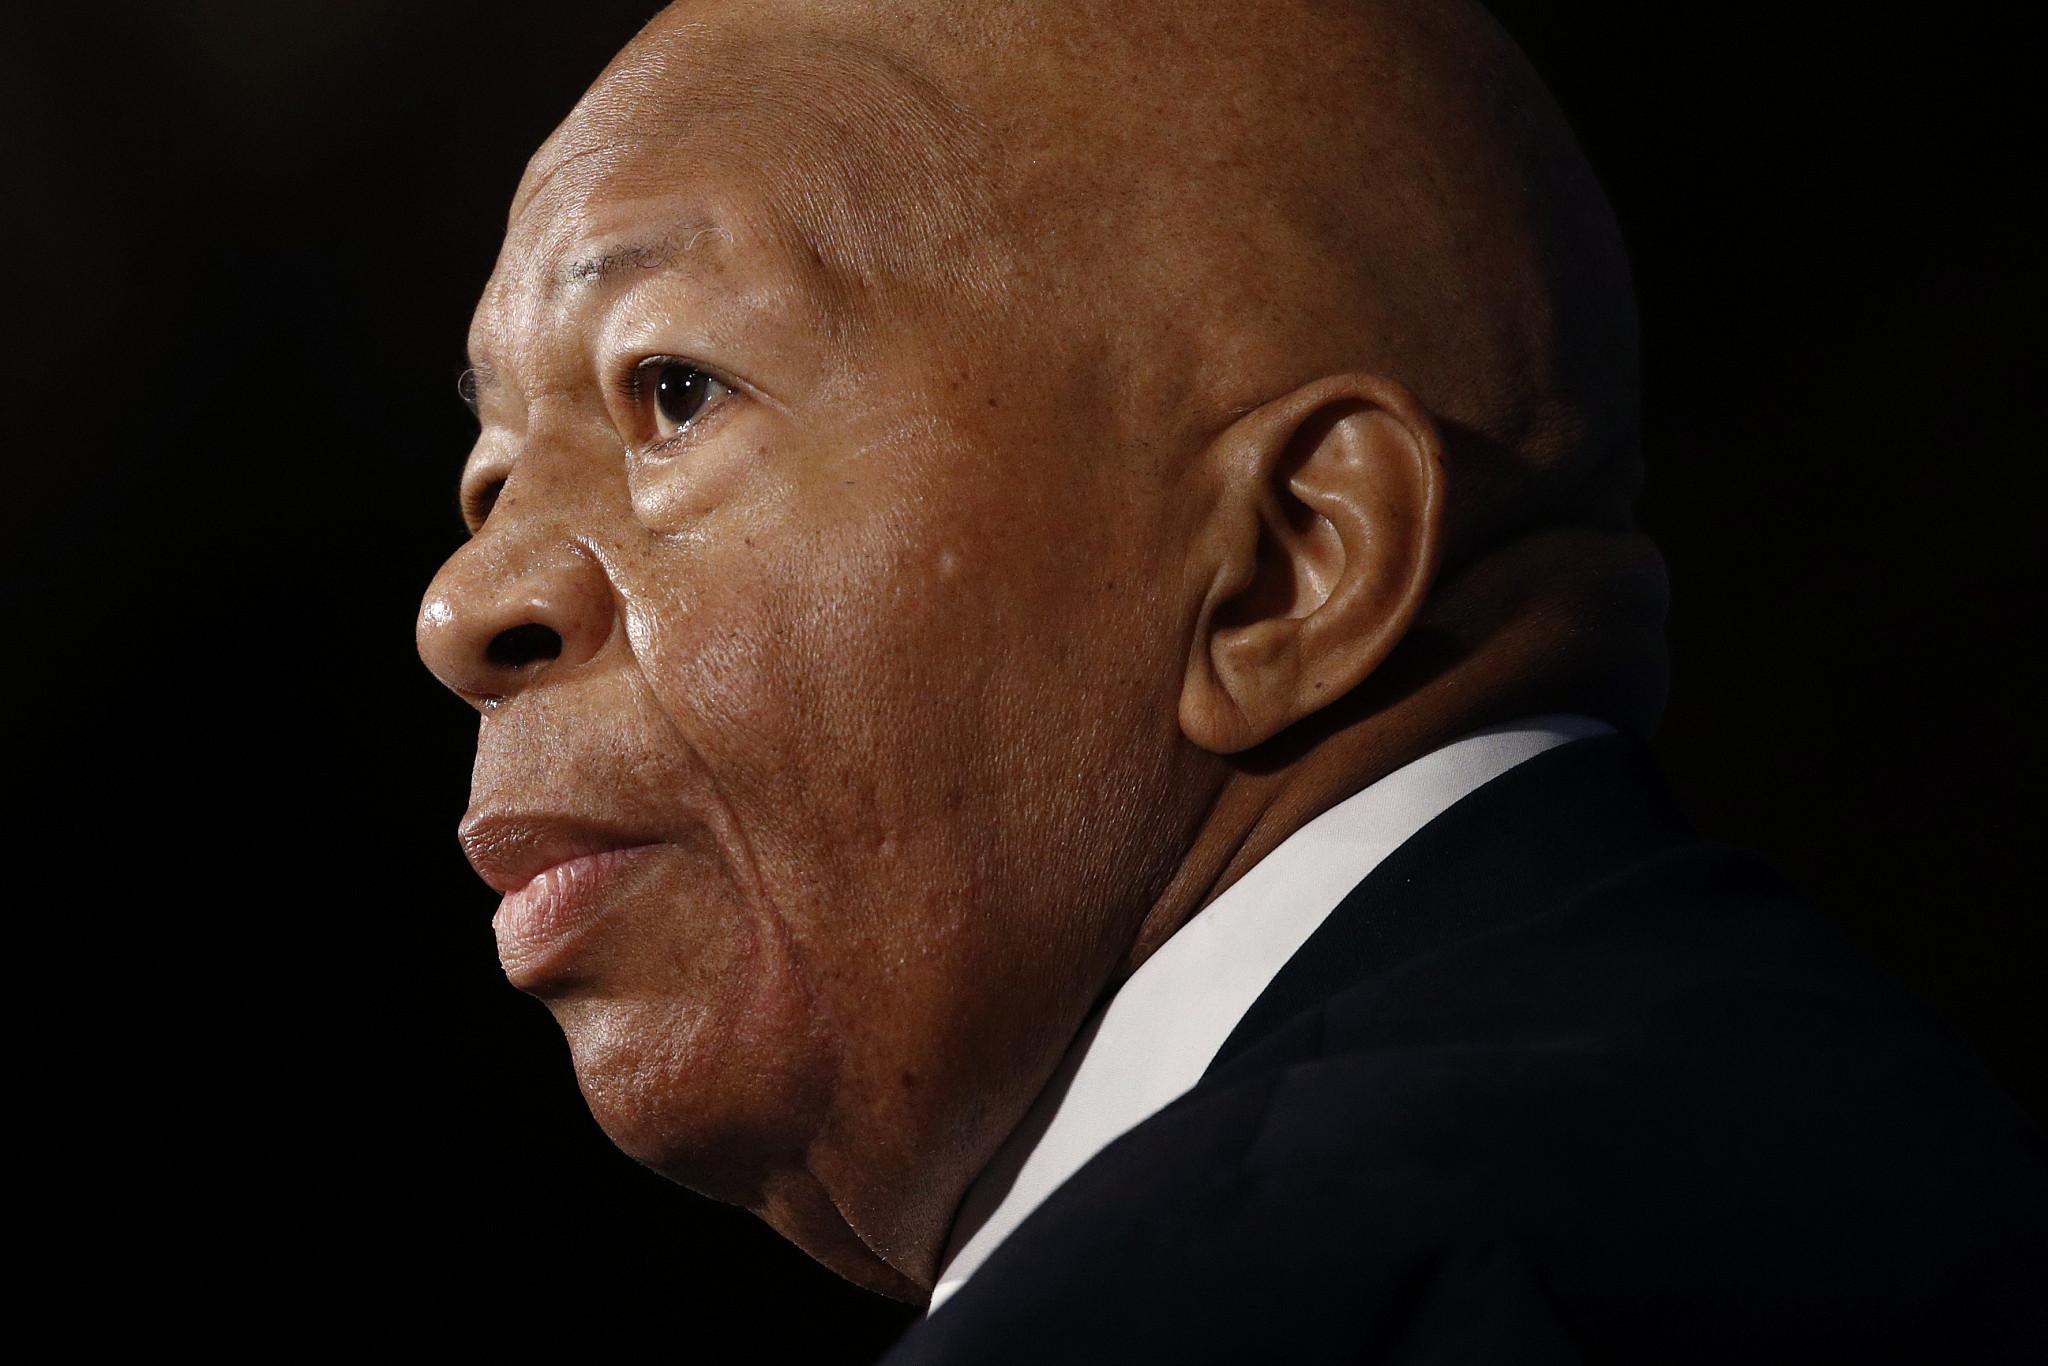 Maryland U.S. Rep. Elijah E. Cummings Has Died